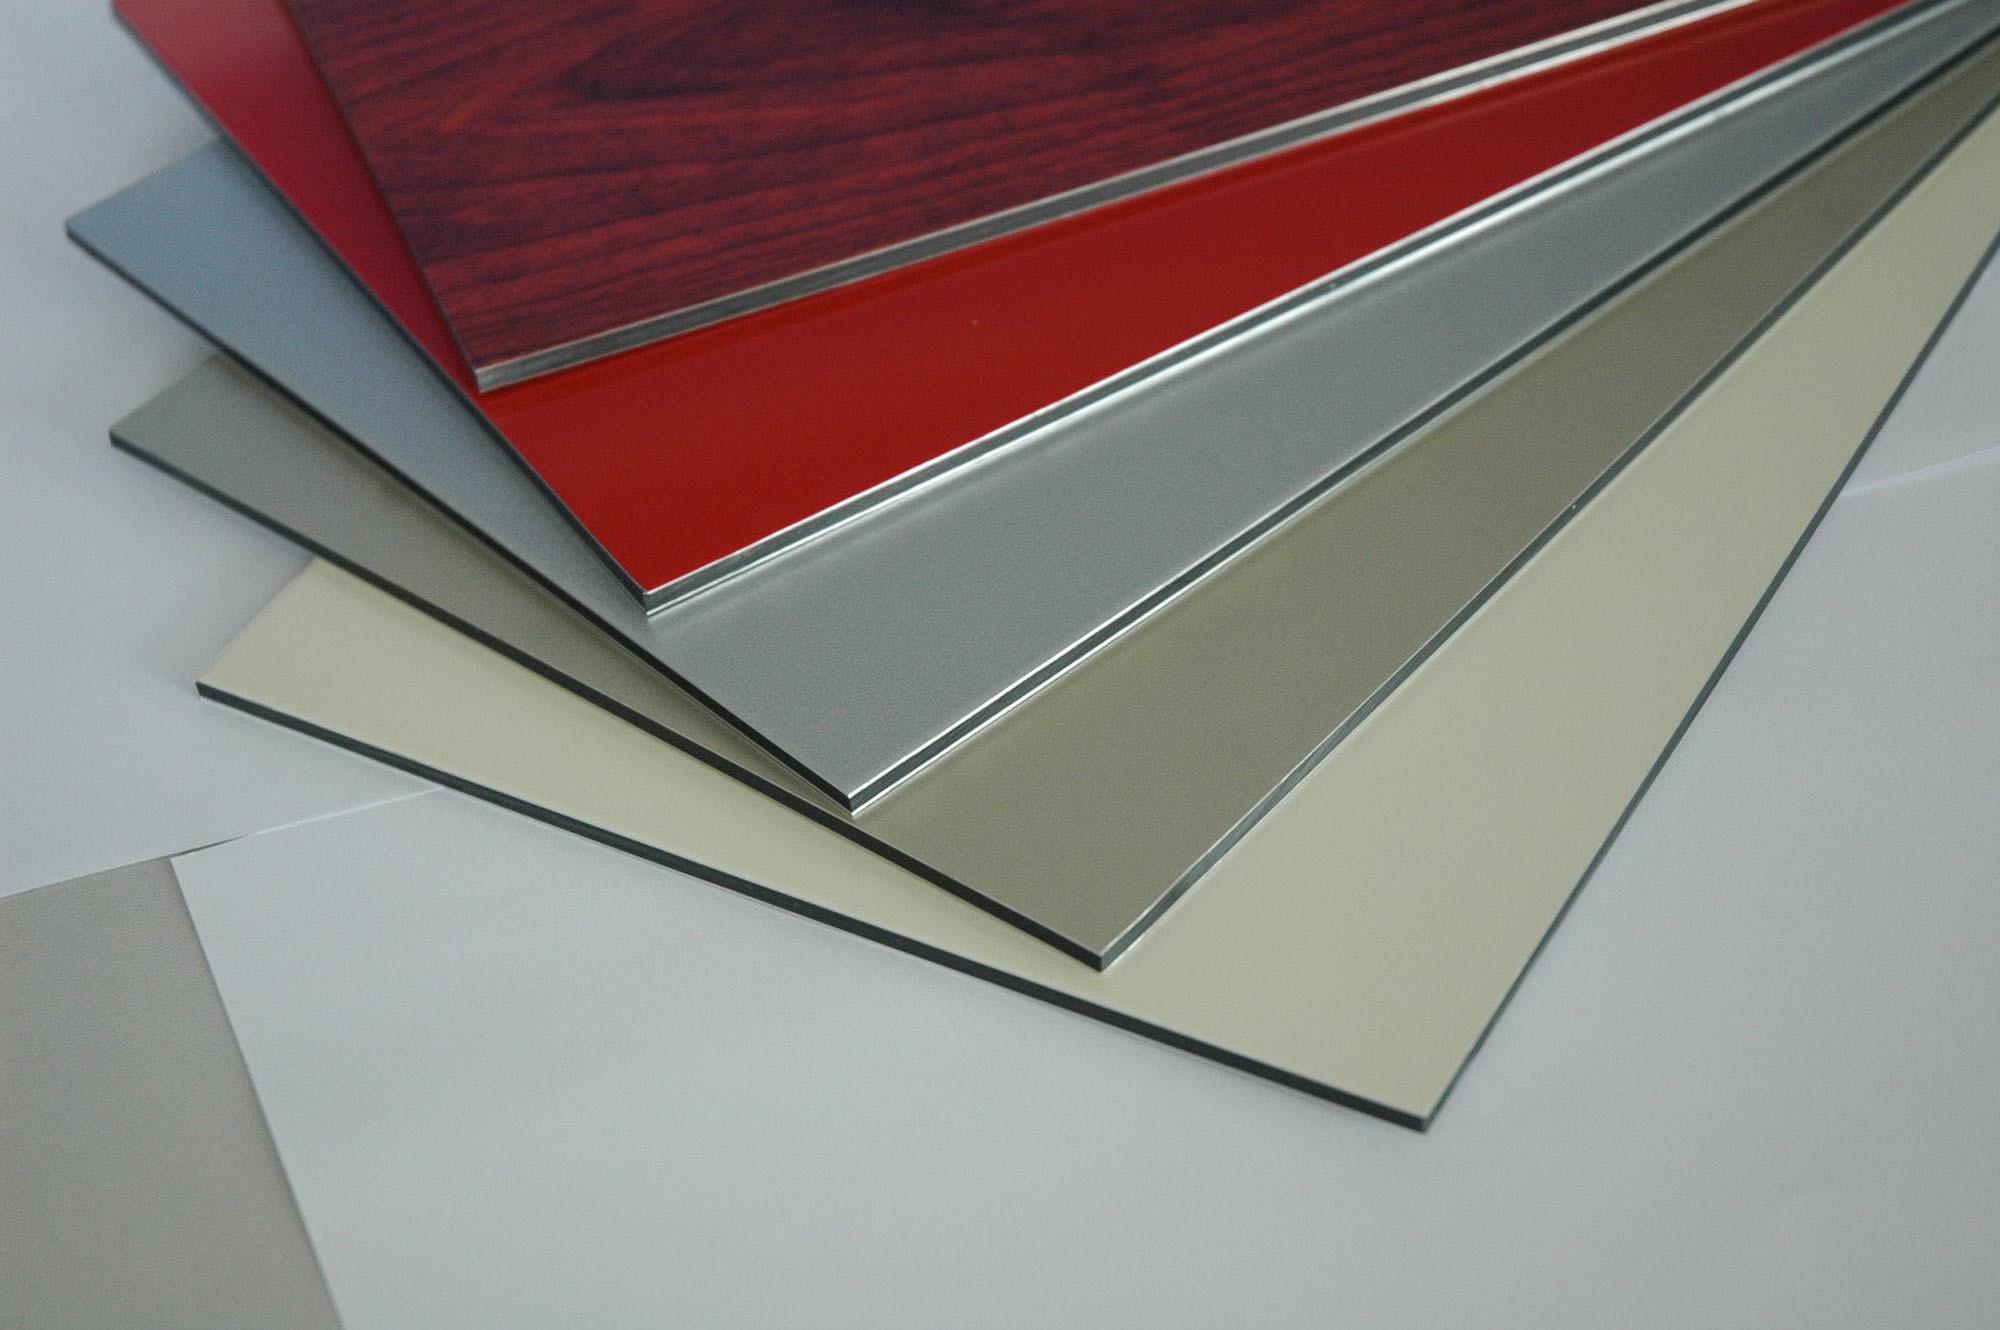 china pvdf aluminum composite panel c 006 photos pictures made in. Black Bedroom Furniture Sets. Home Design Ideas